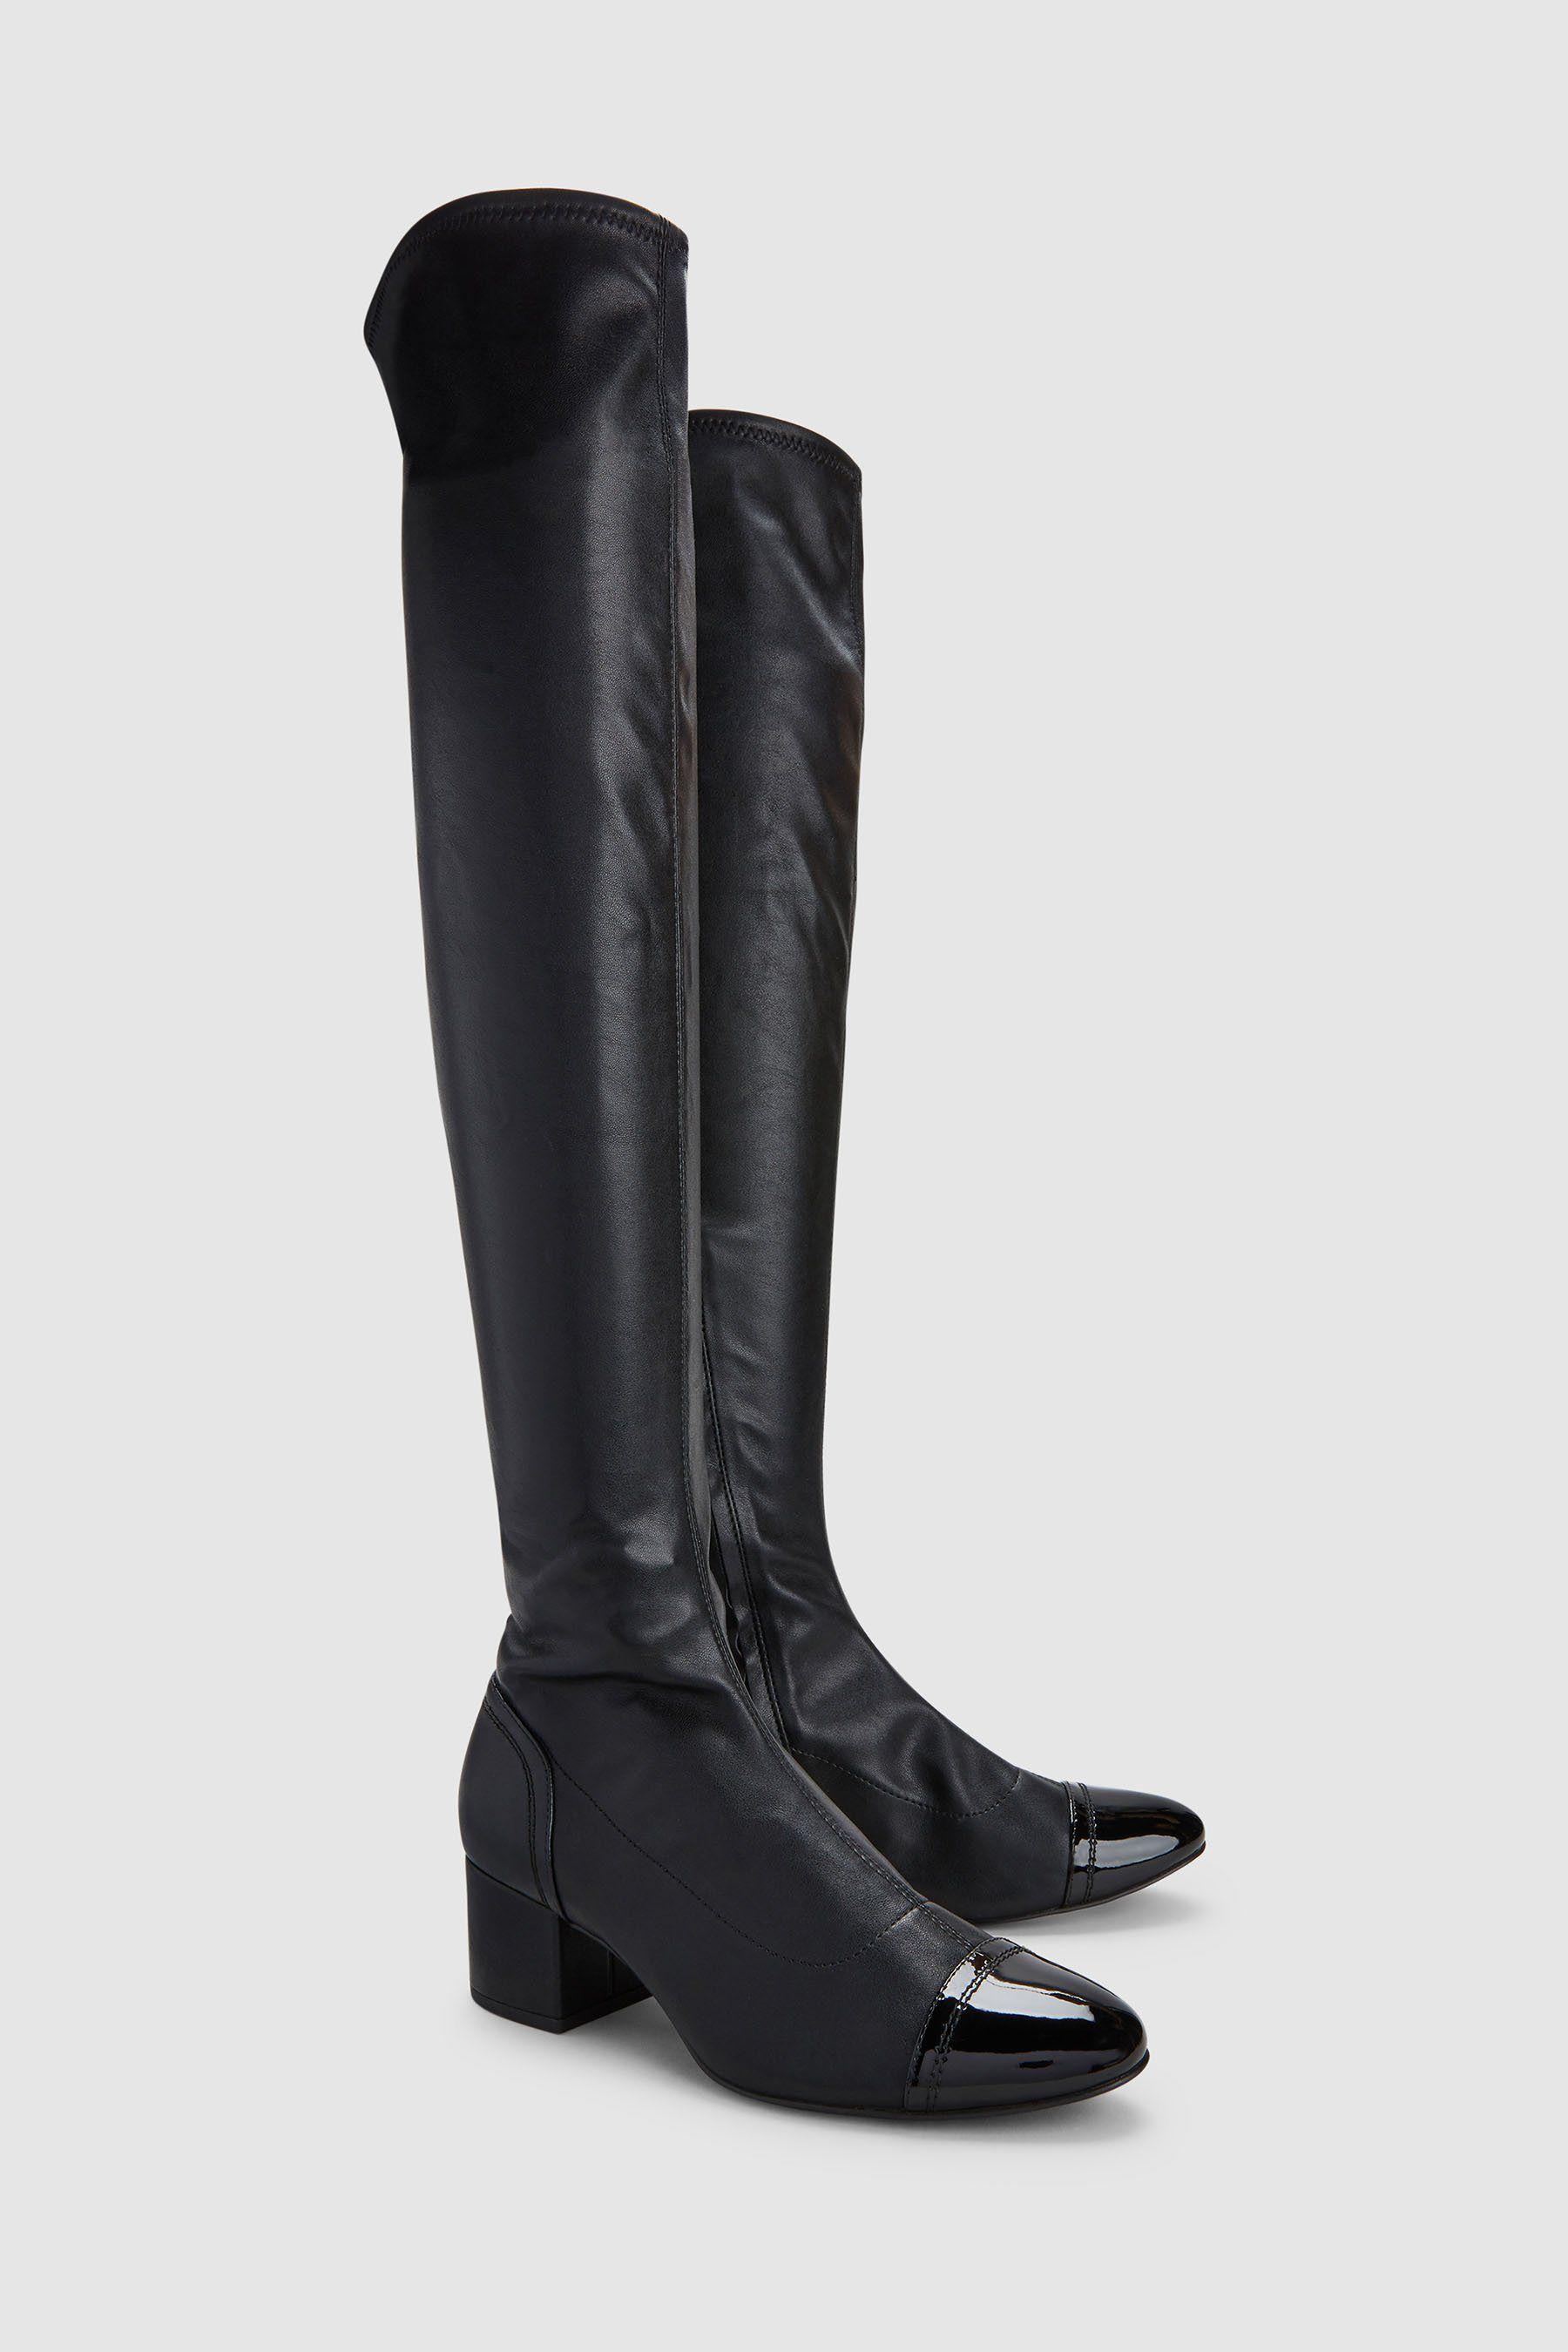 5f64f1ac856eac  Schuhe  Damen  Next  OverkneeStiefel  niedrigem  Blockabsatz  schwarz   05057823910769